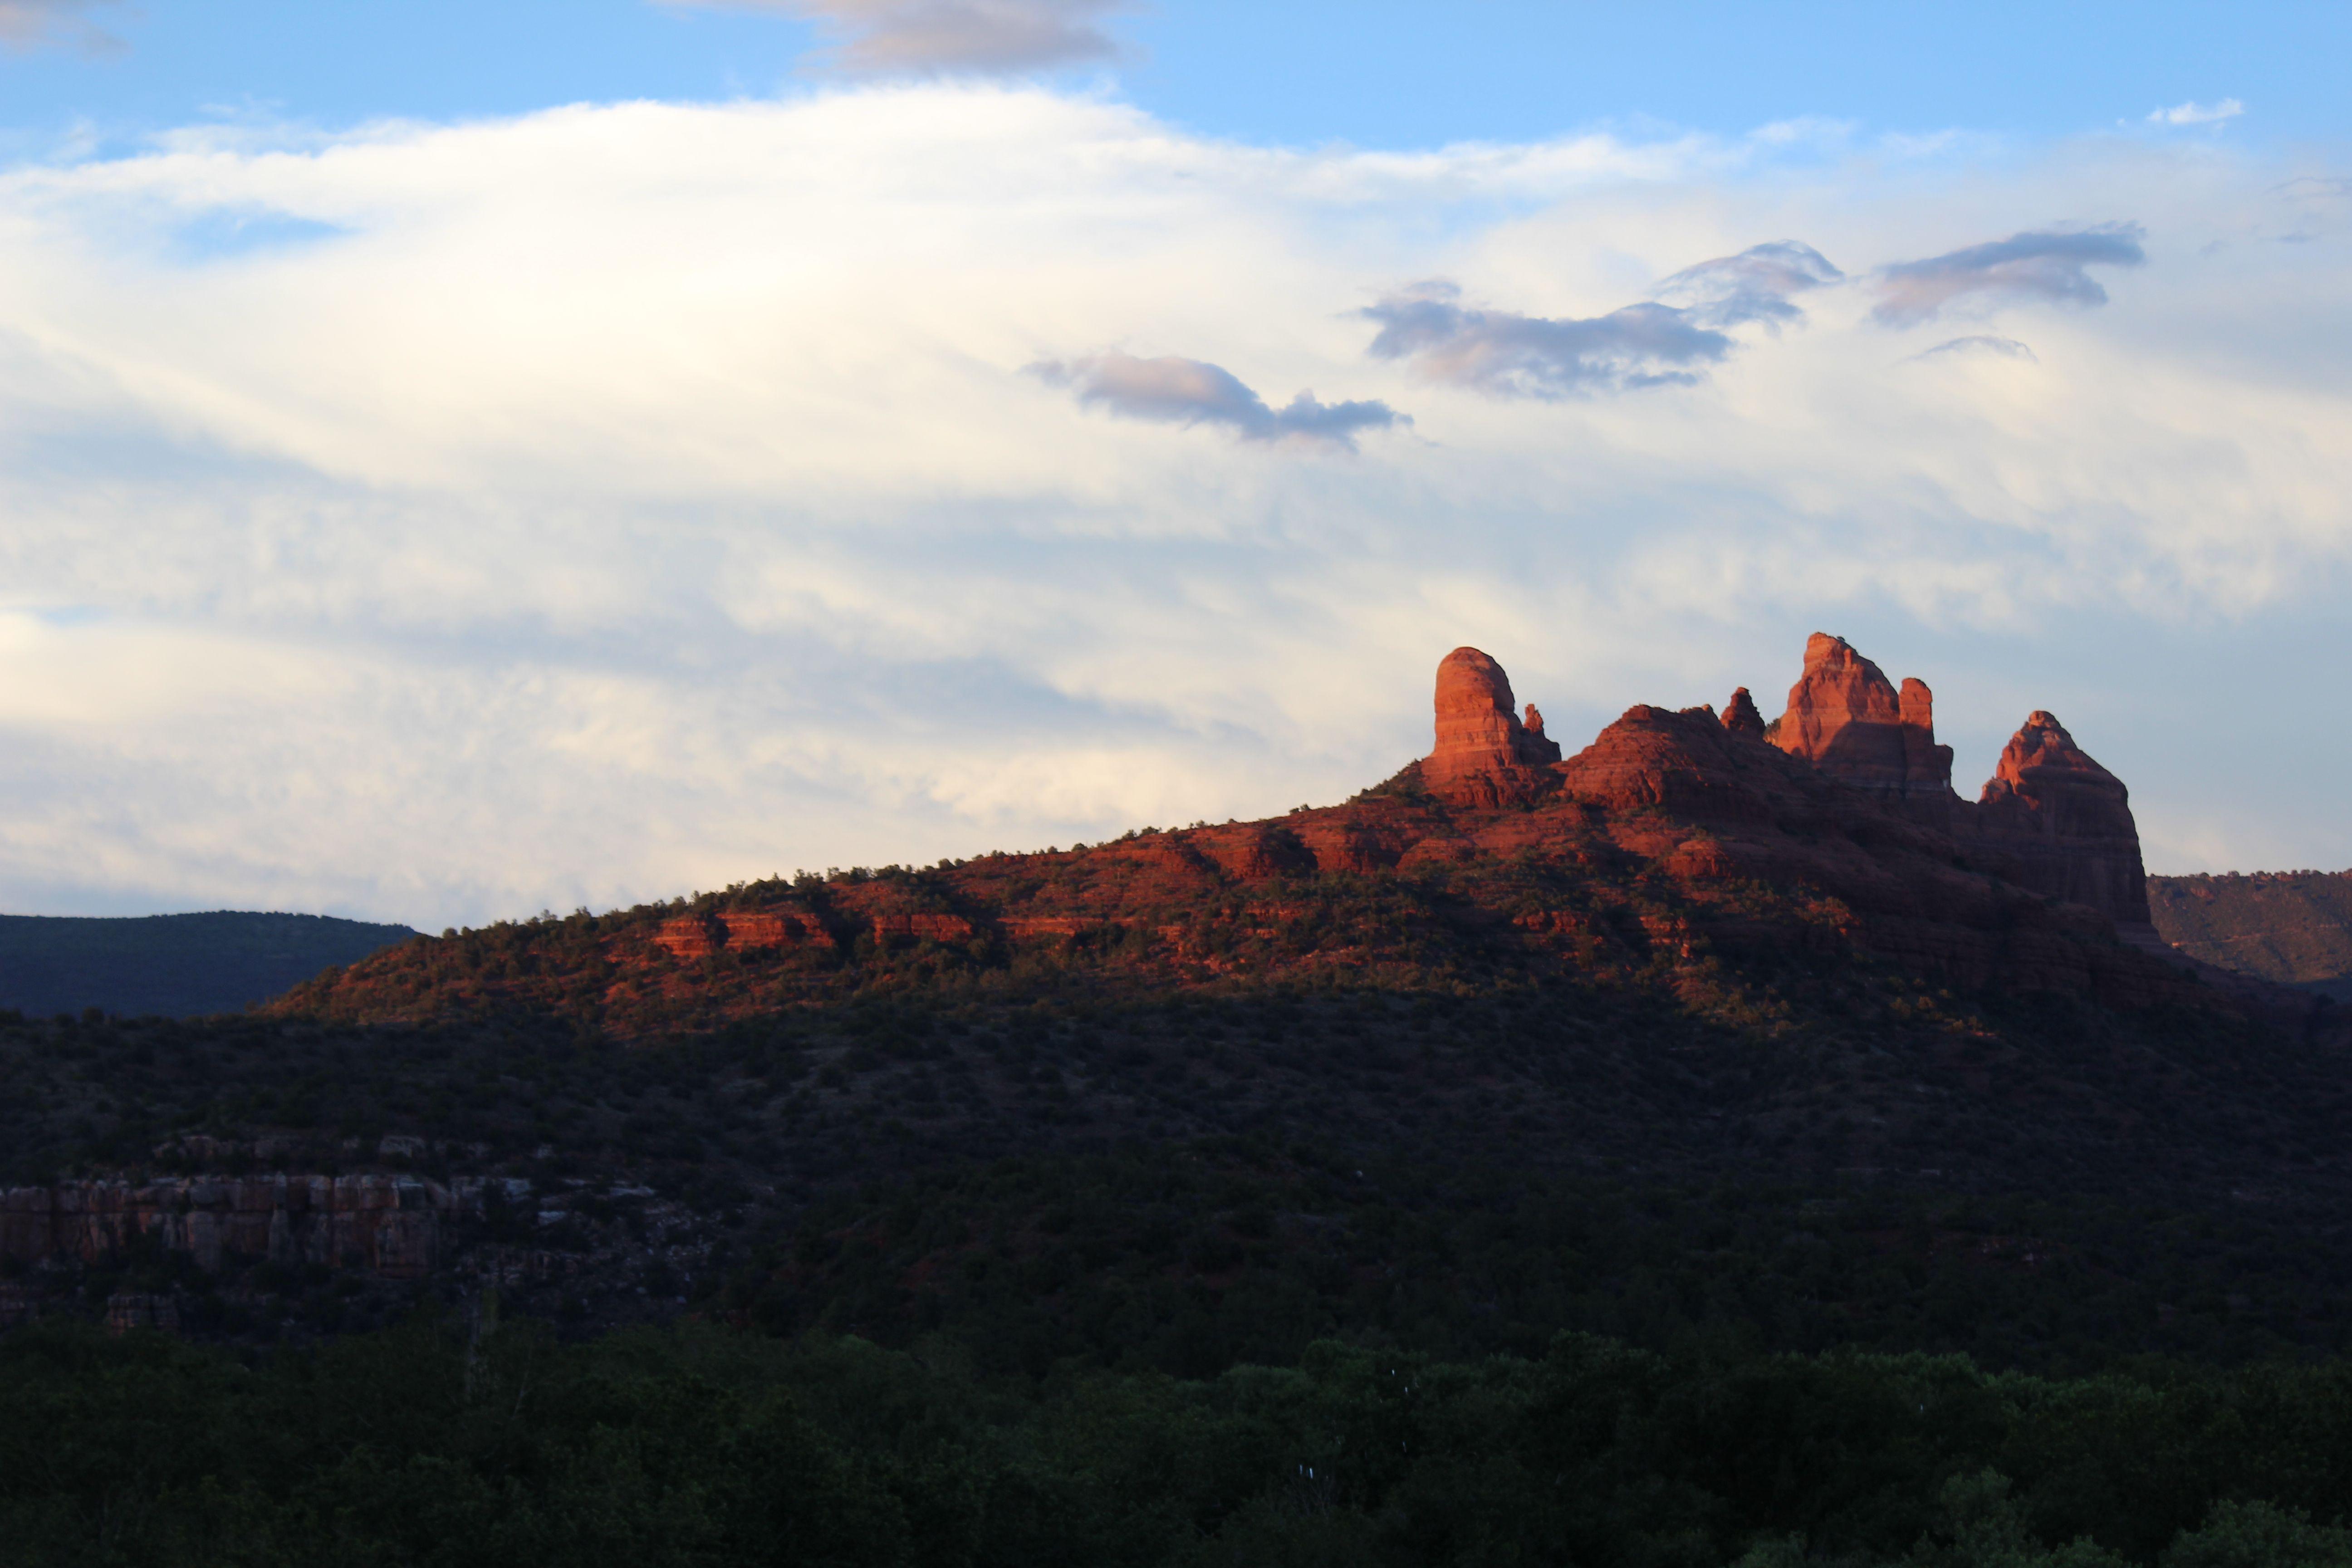 Mountains in Sedona, Arizona http://makennahspeak.blogspot.com